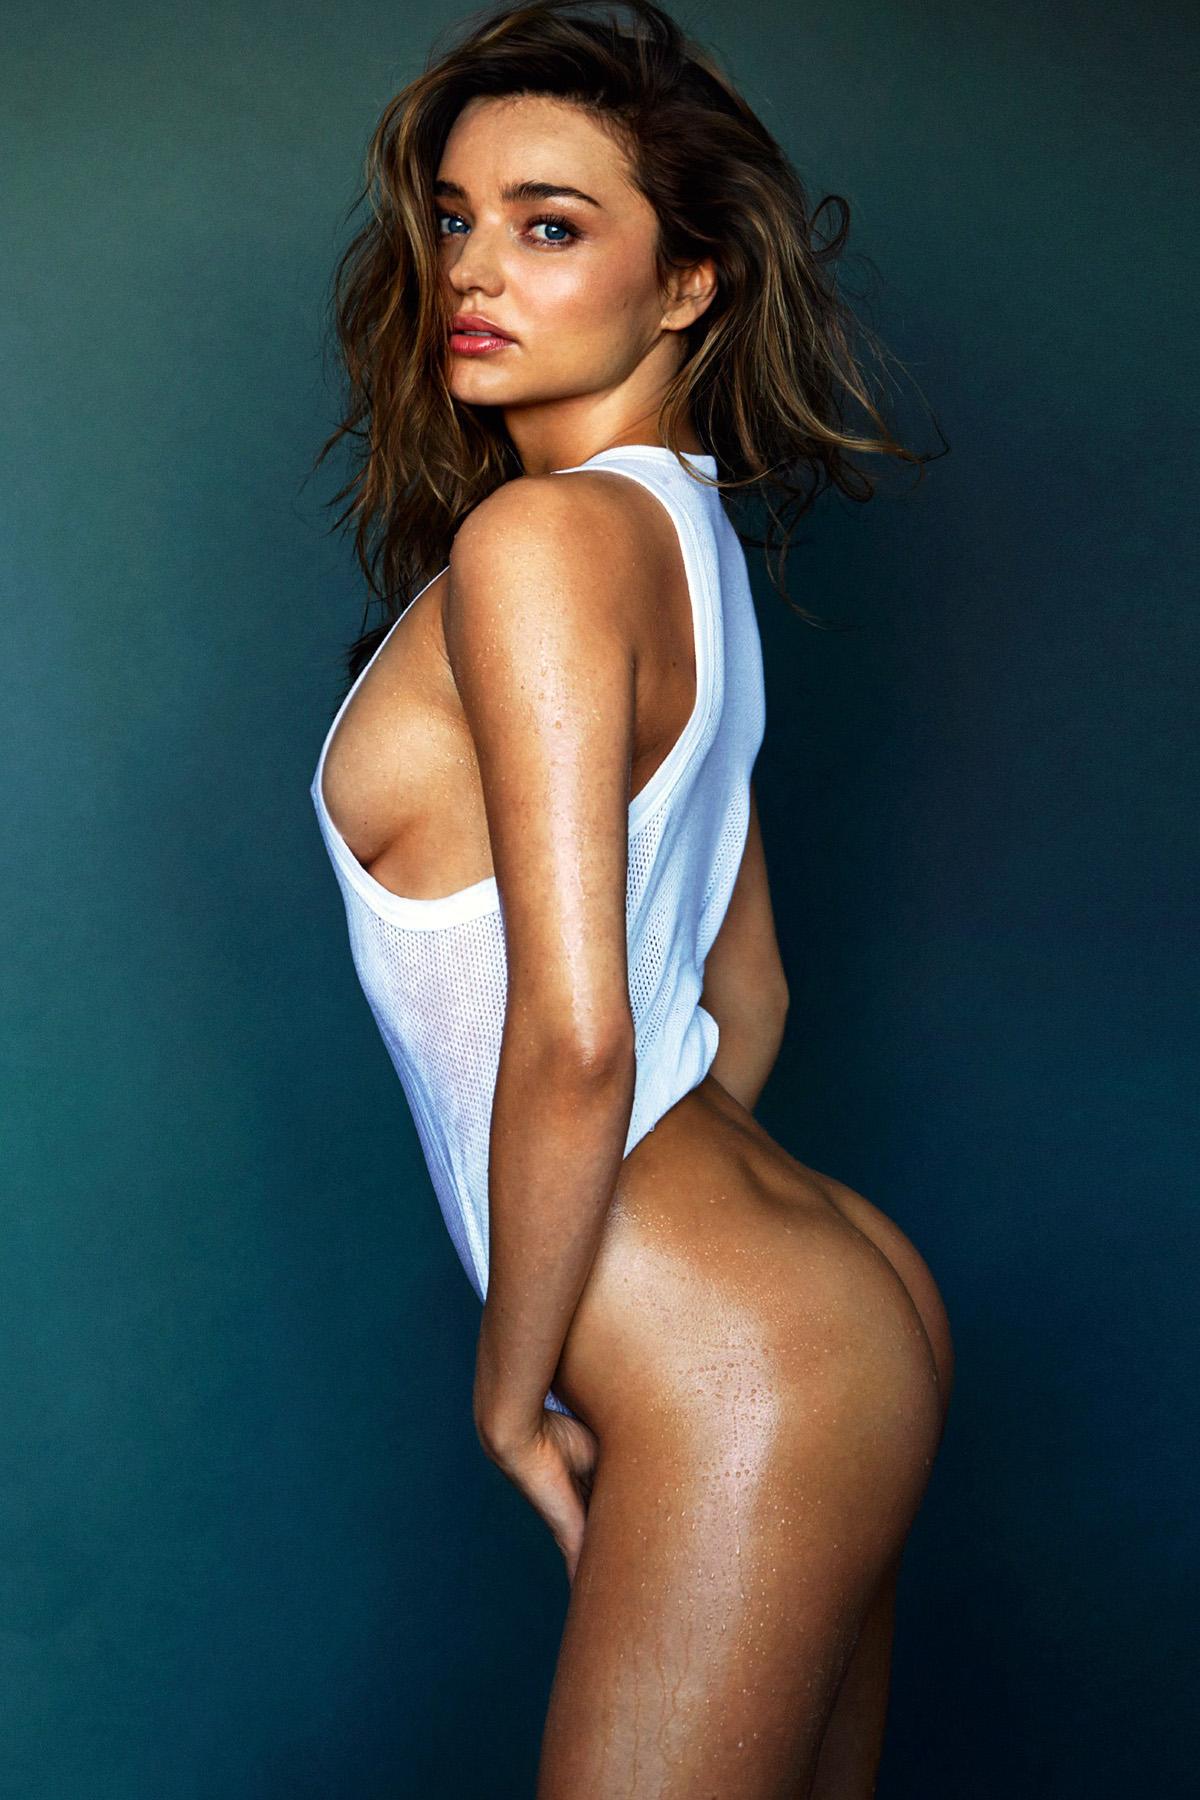 Topless women supermodels naked bent